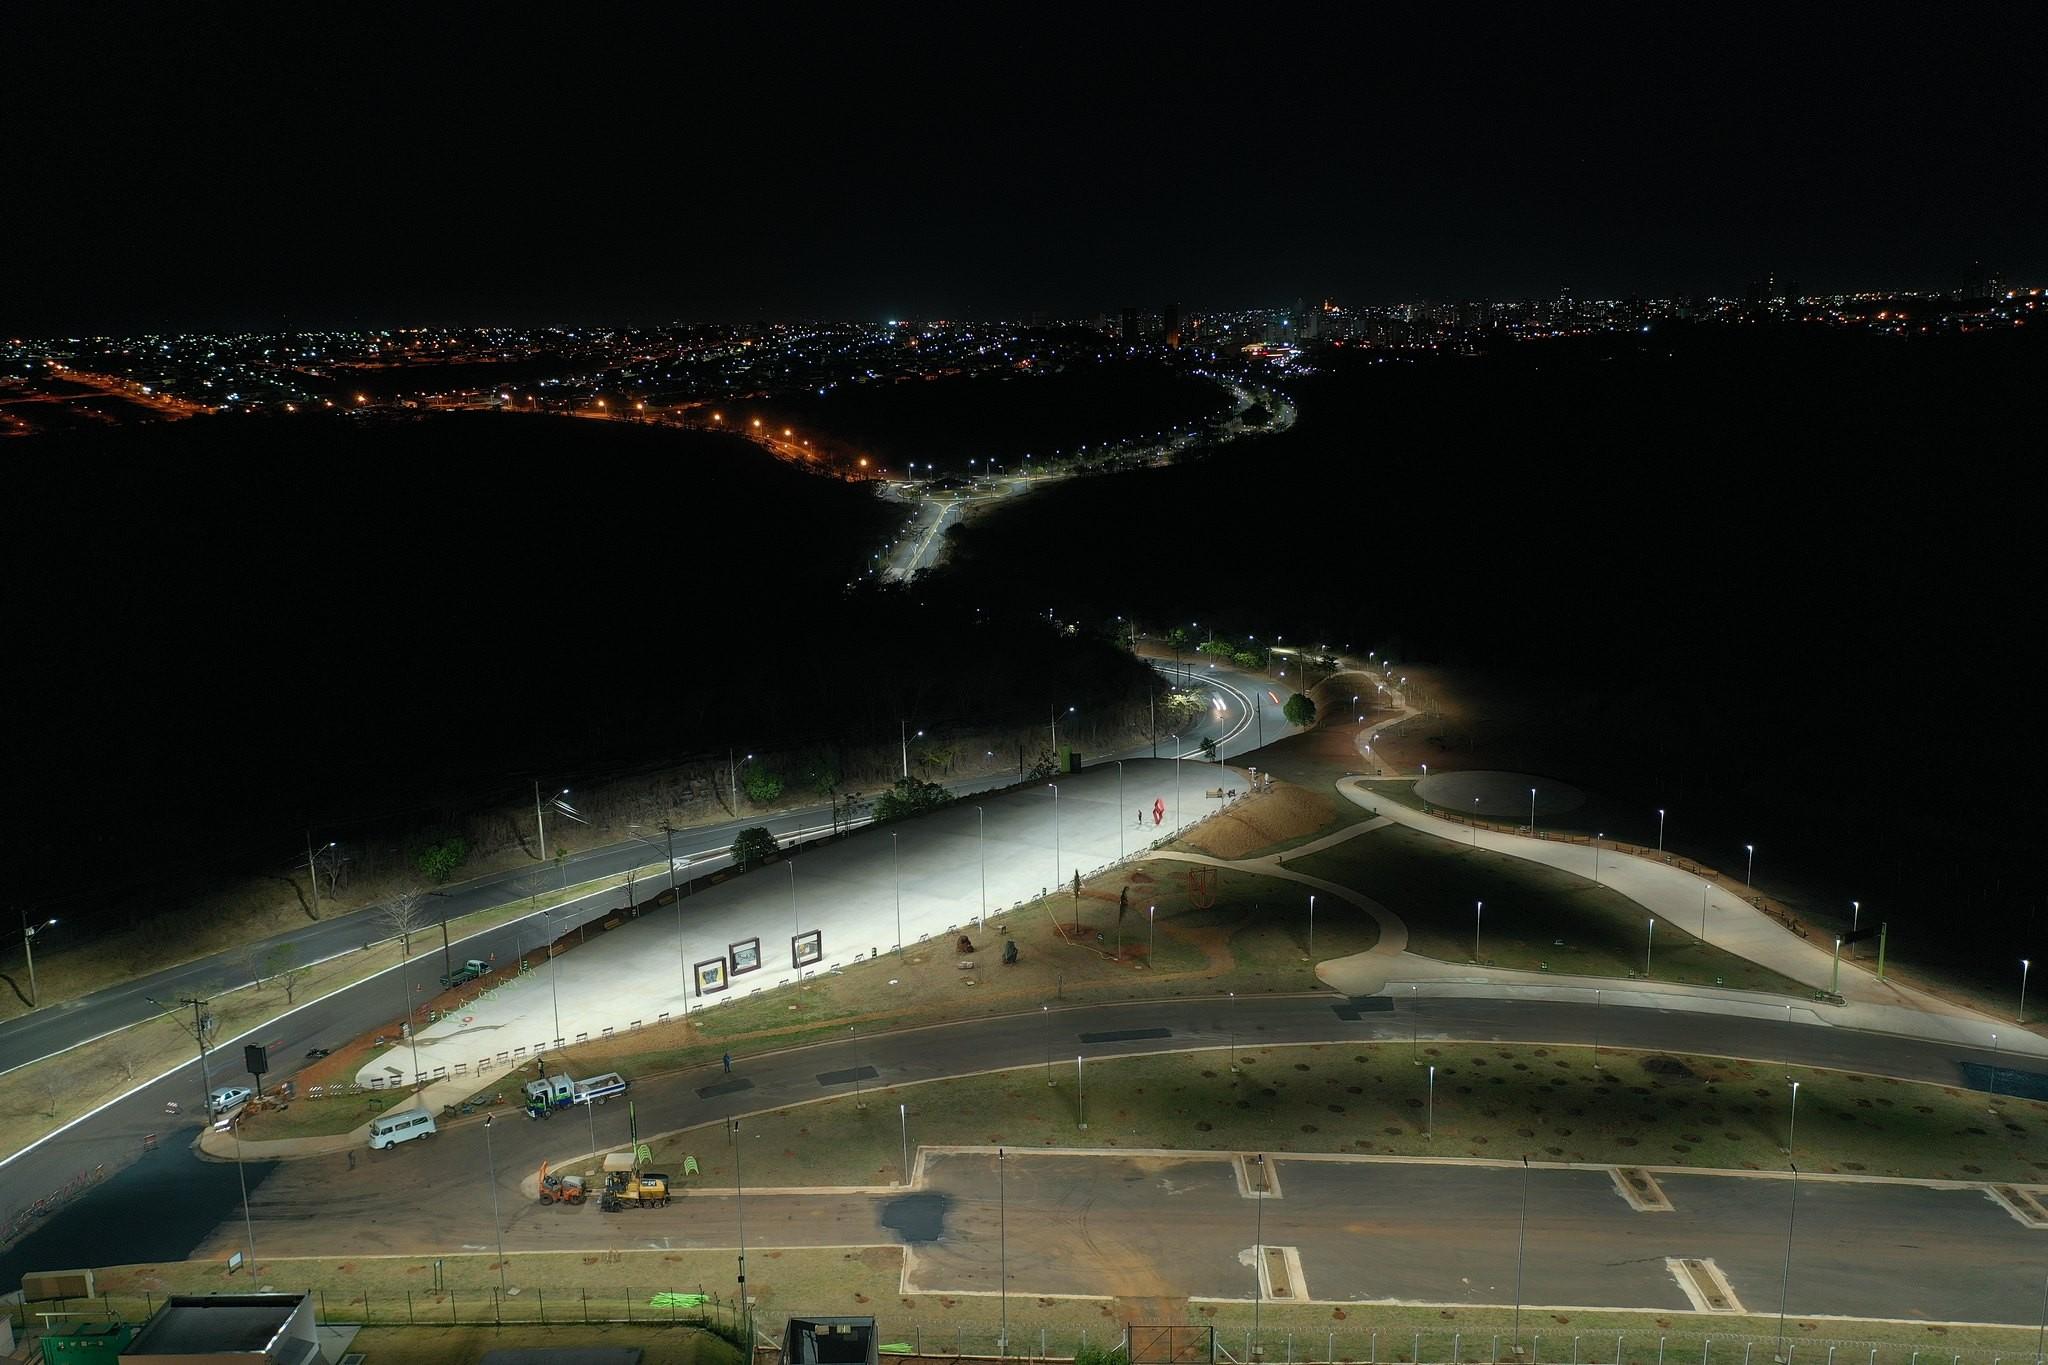 Mirante 'Uberaba 200 anos' e Parque Linear 'João Gilberto Ripposati' são inaugurados